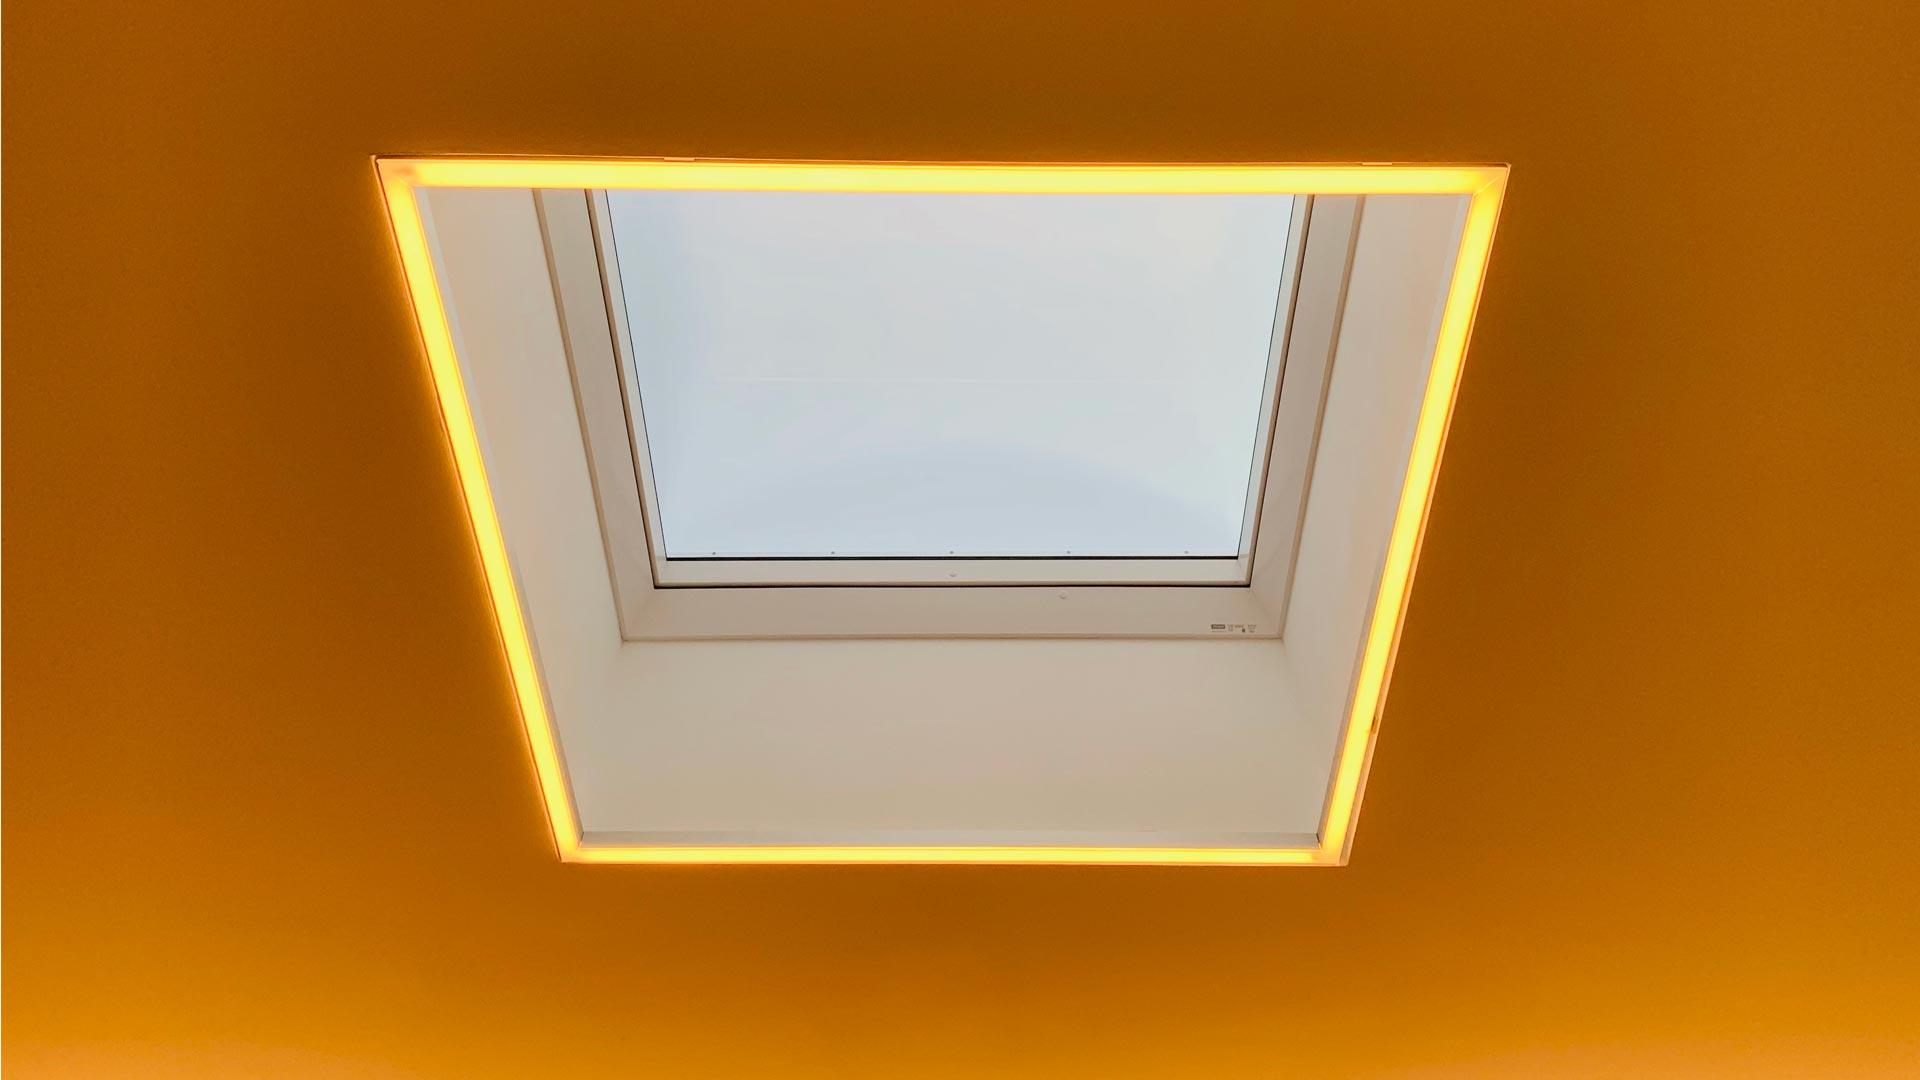 MAASS-Lichtplanung_Beleuchtung eines Einfamilienhaus__191007-MAASS-Licht_EFH_Deckenlicht